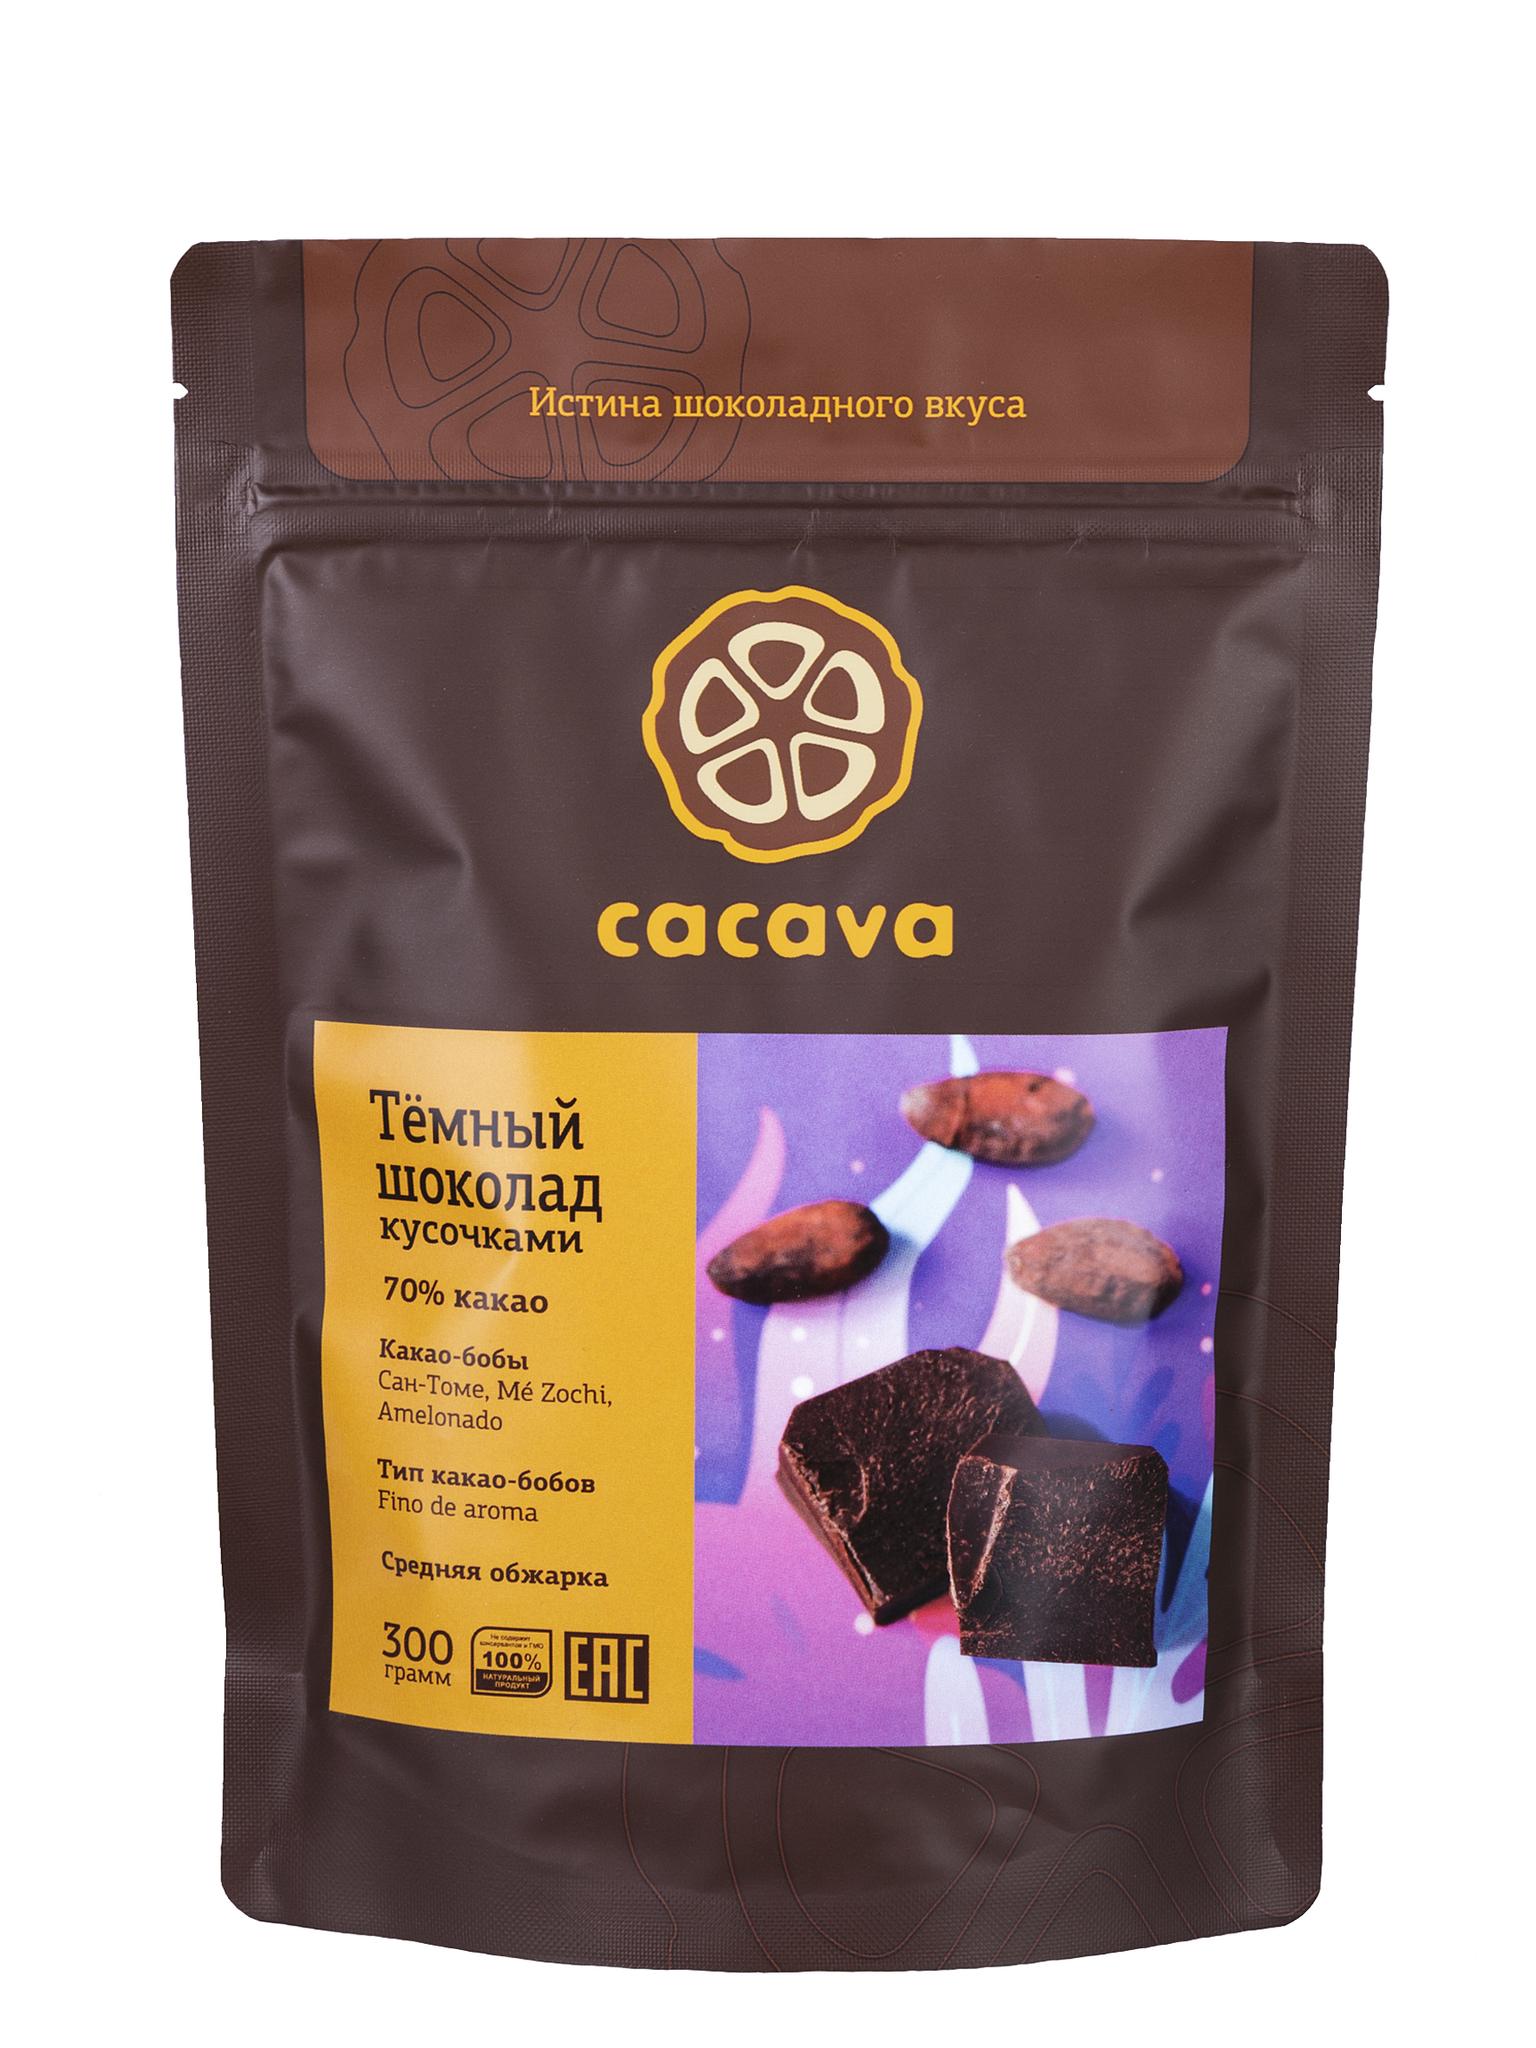 Тёмный шоколад 70 % какао (Сан-Томе), упаковка 300 грамм